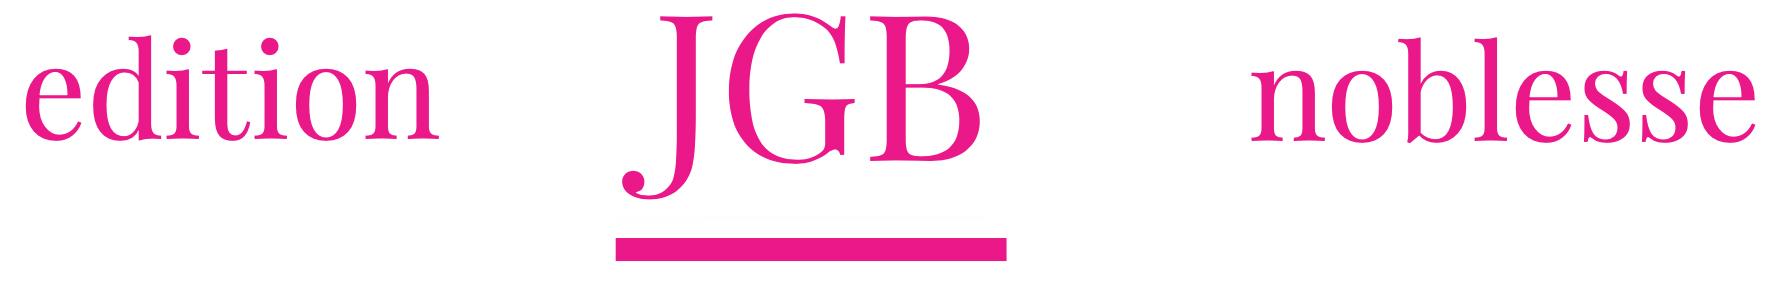 jgb edition noblesse